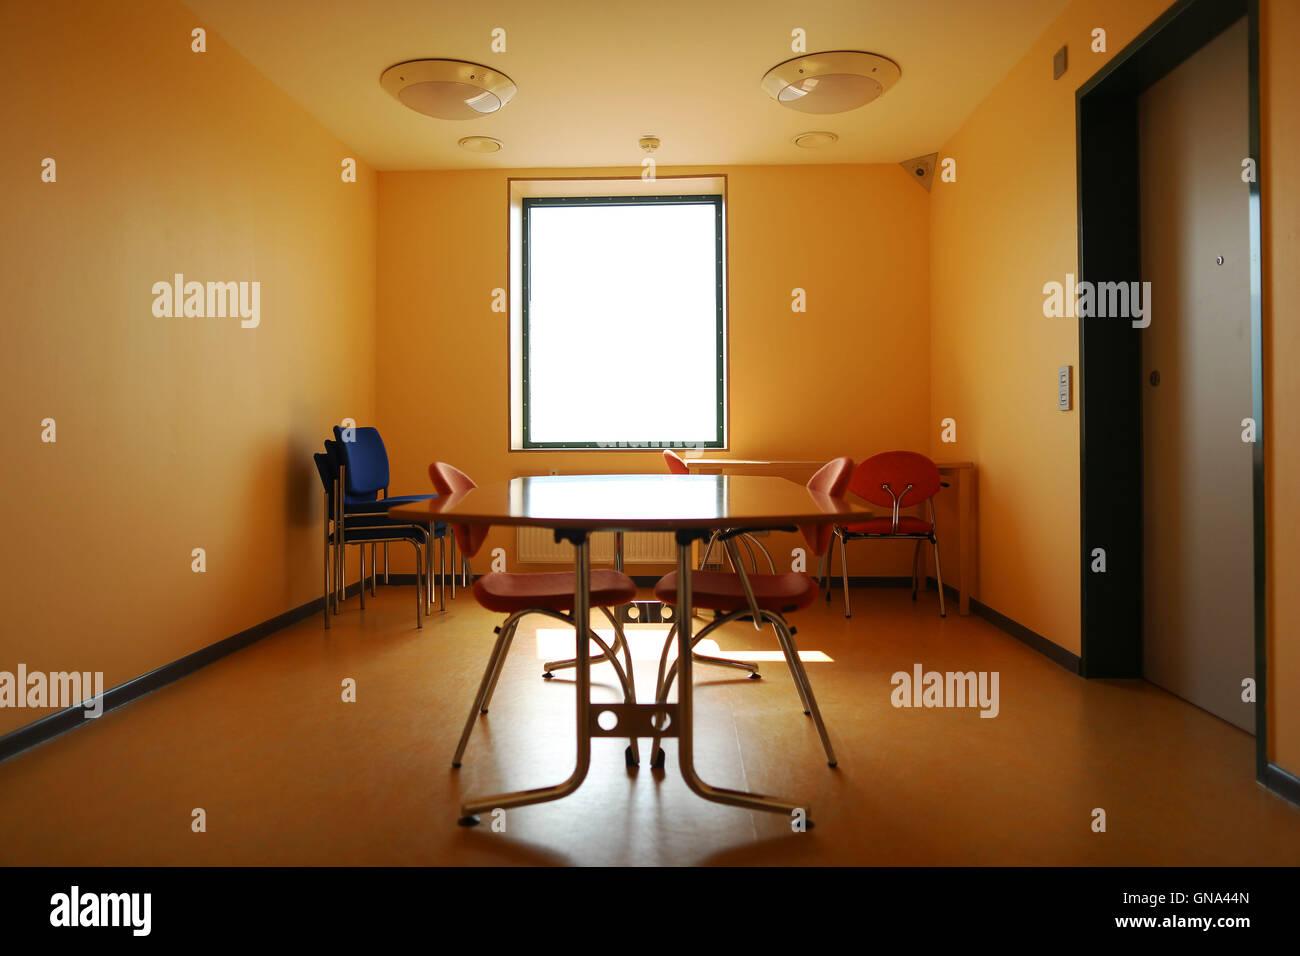 Lvr Clinic Hau Stockfotos & Lvr Clinic Hau Bilder - Alamy